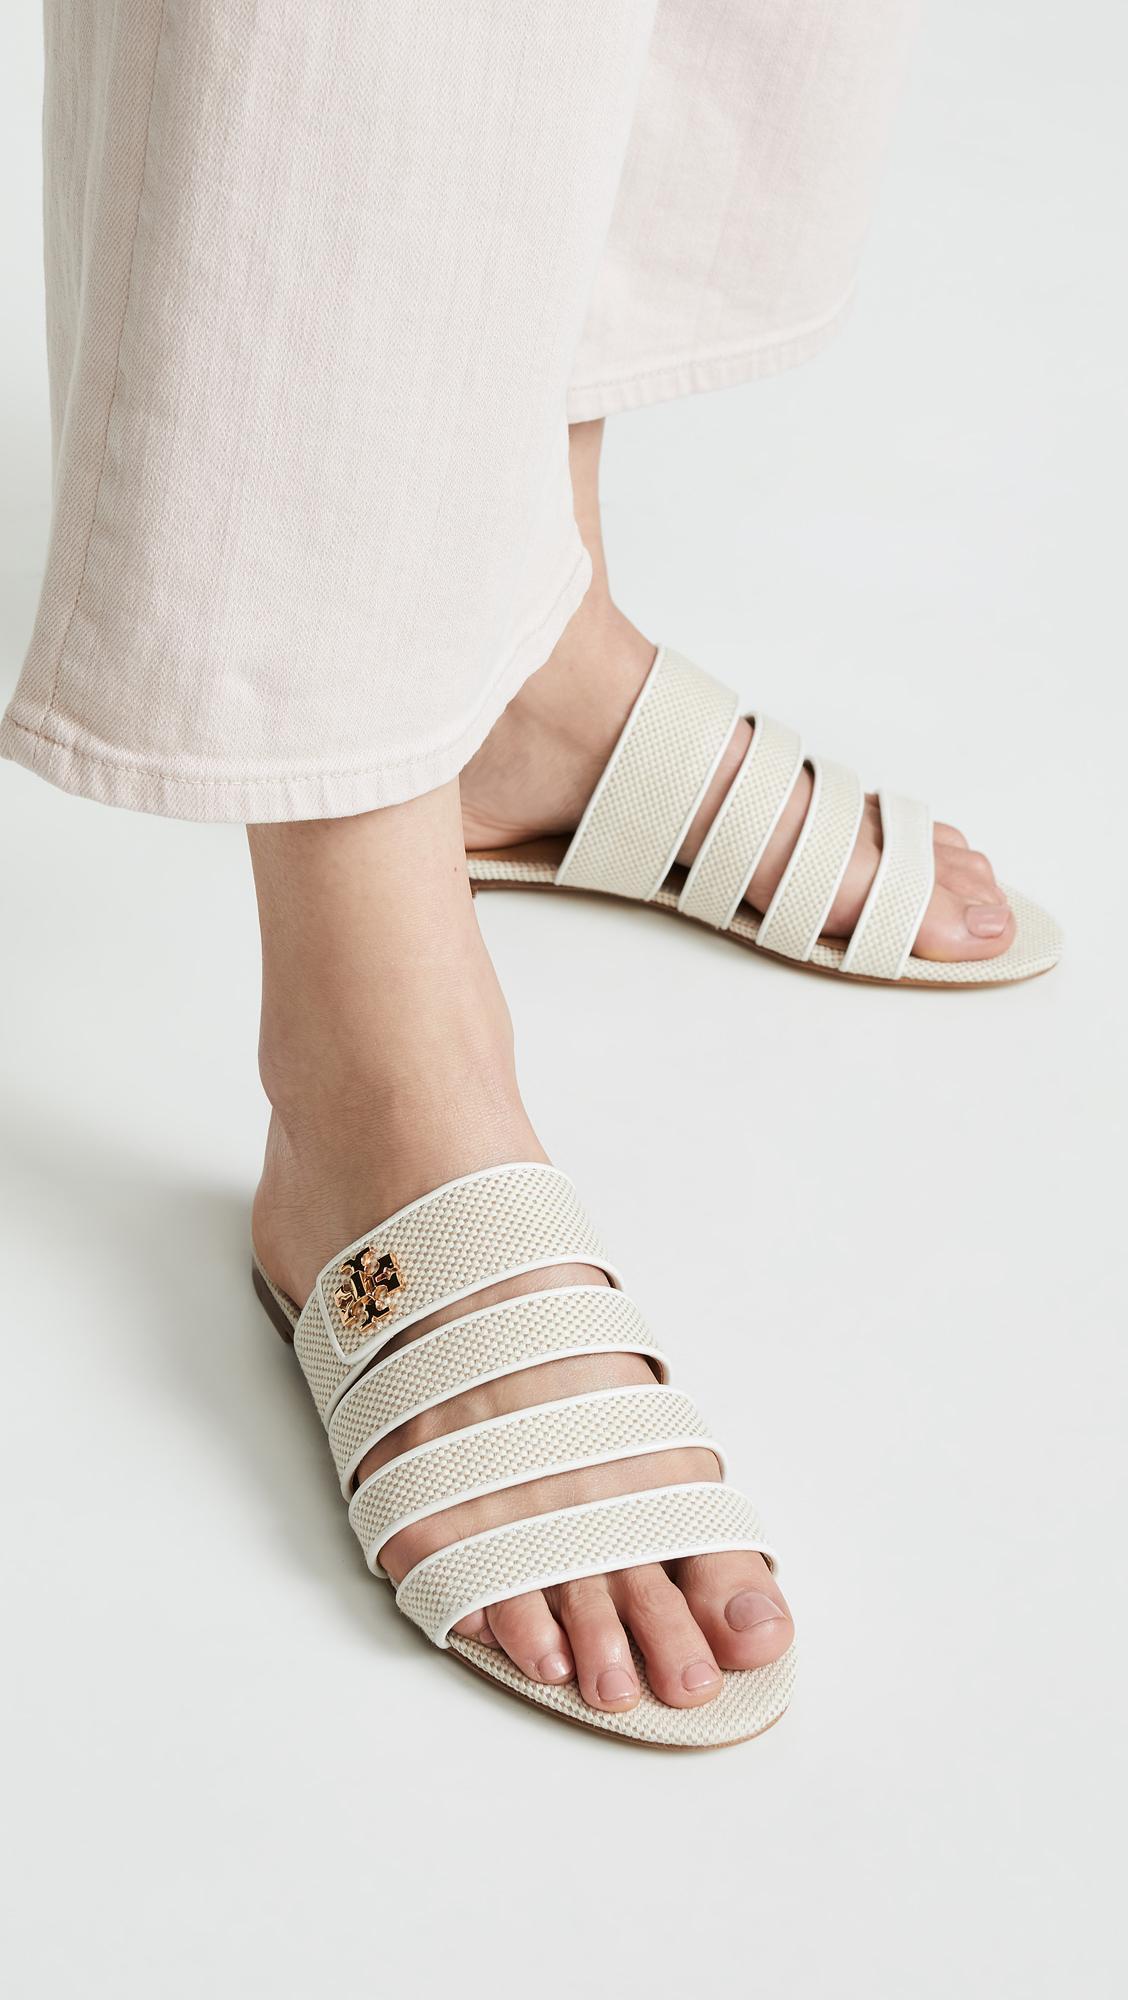 6065cd7d4c60 Tory Burch - Multicolor Kira Multiband Sandals - Lyst. View fullscreen